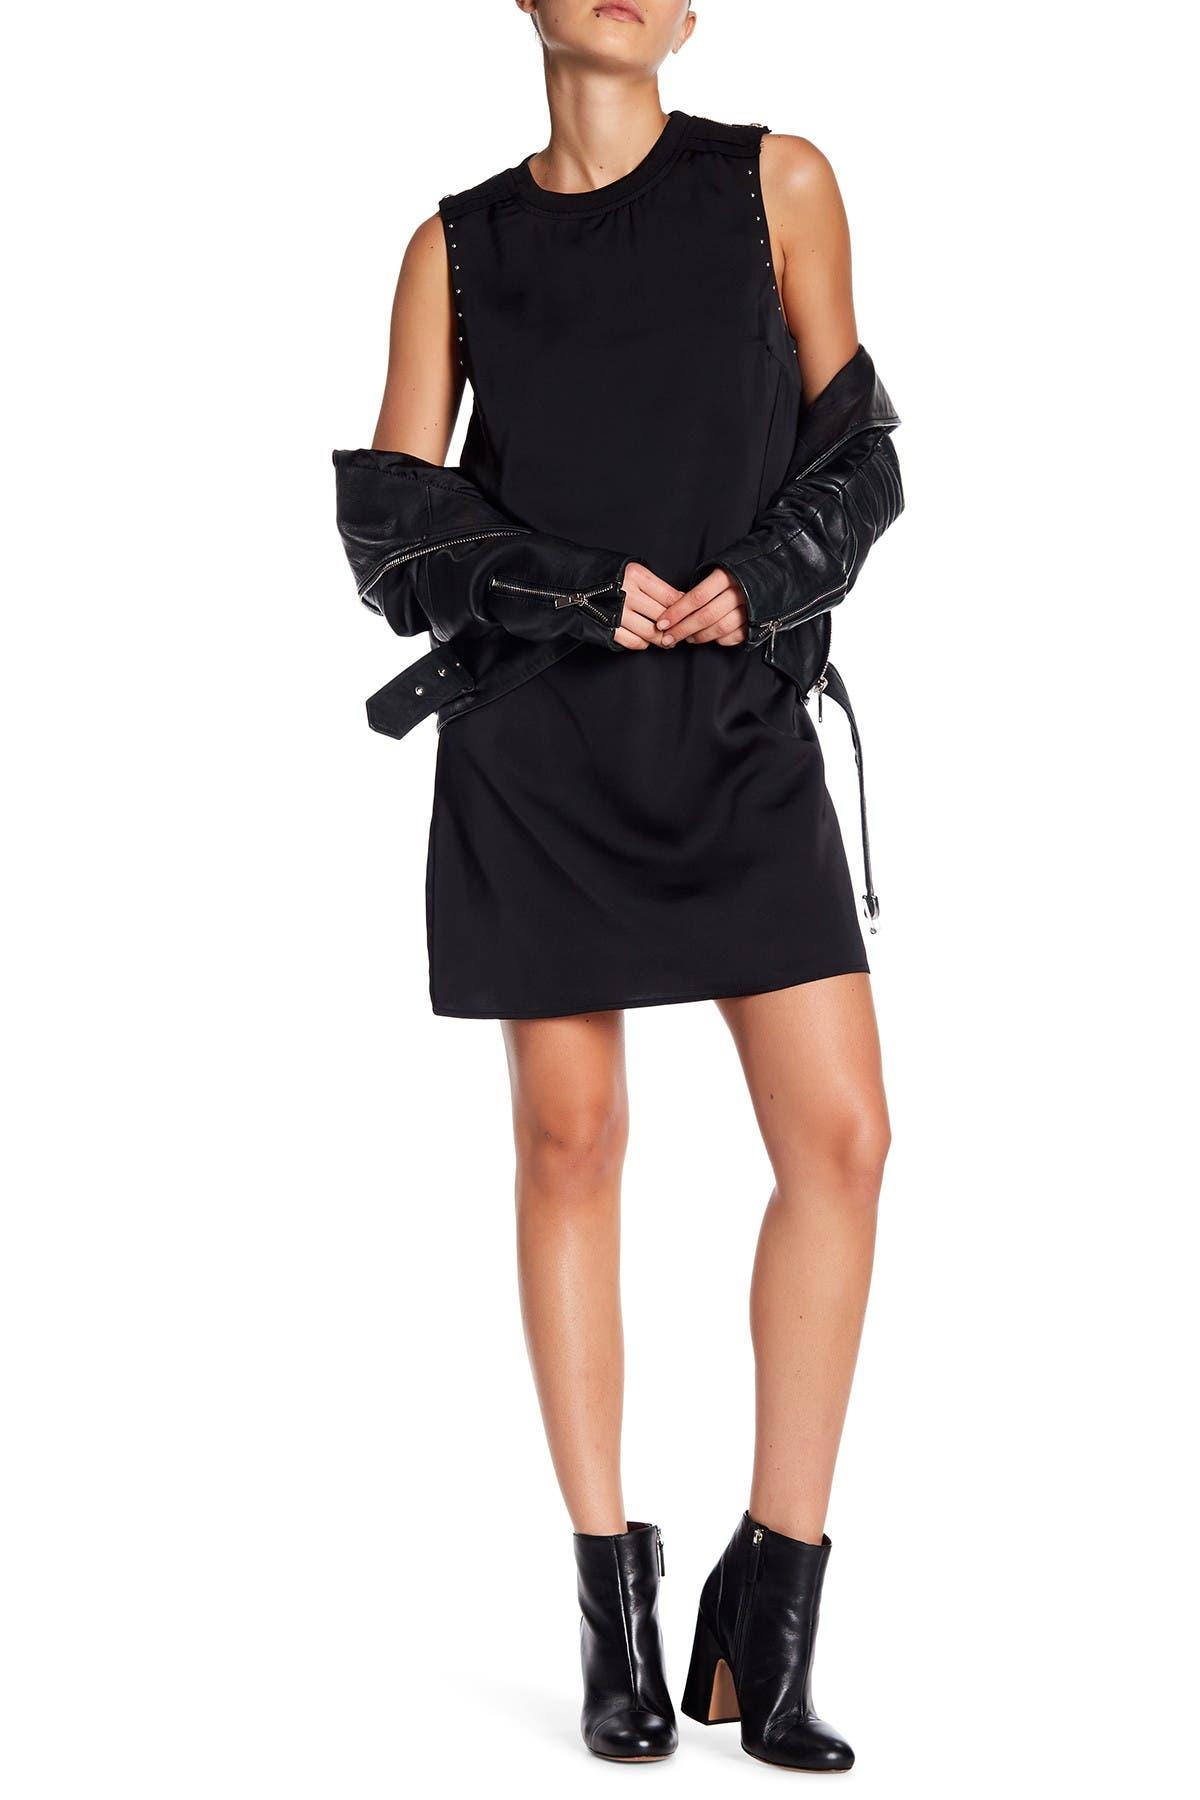 Image of Sugarlips Izabel Satin Shift Dress